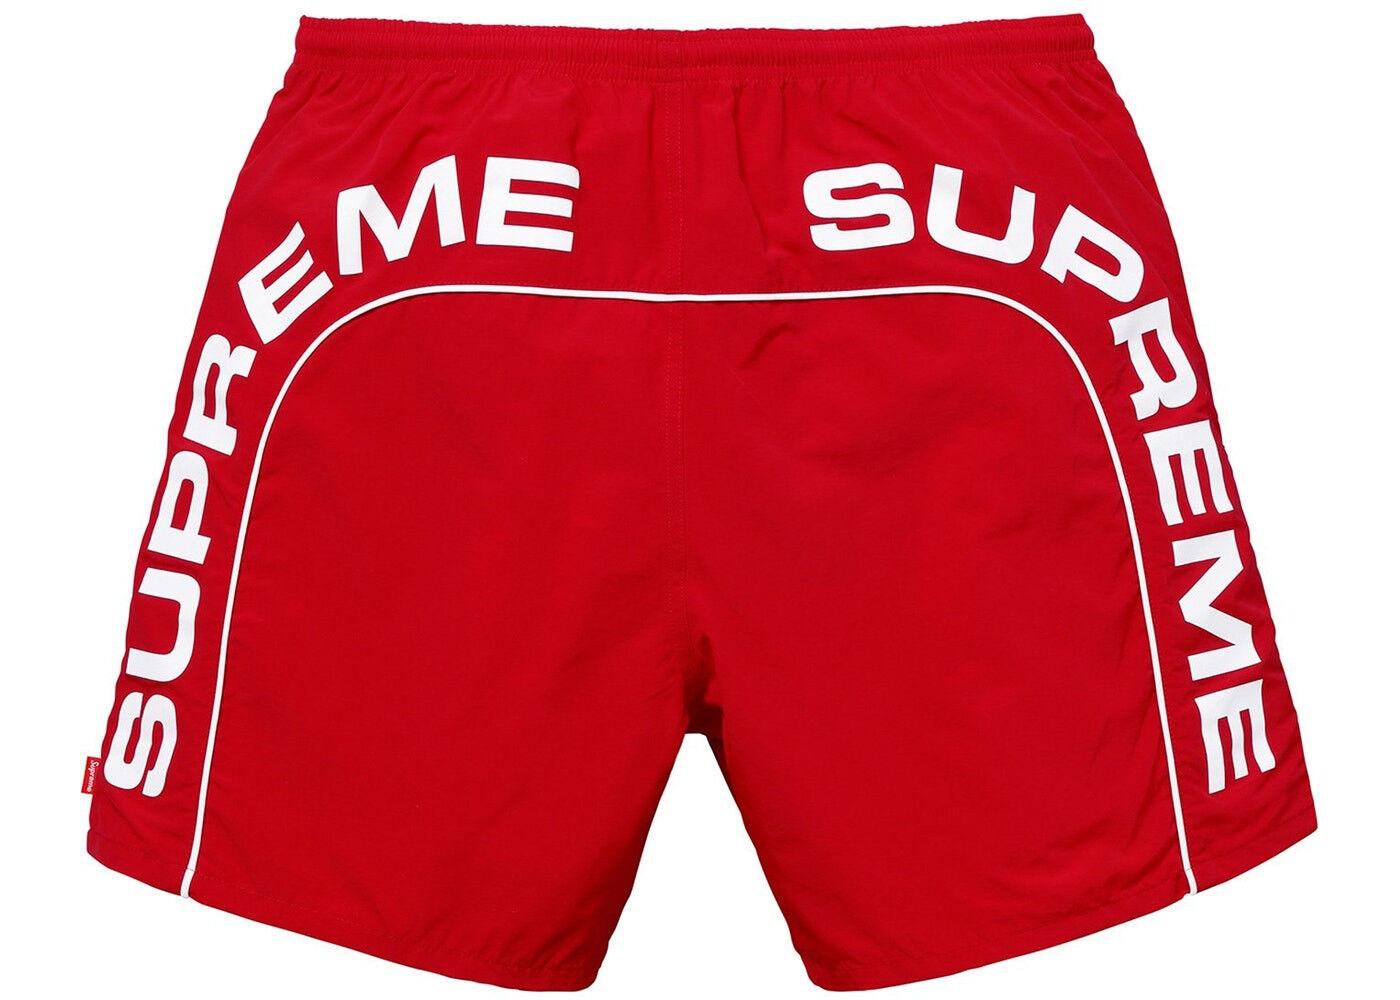 Supreme Arc Logo Water Short - Red  - Sizes Medium & Large -  Brand New